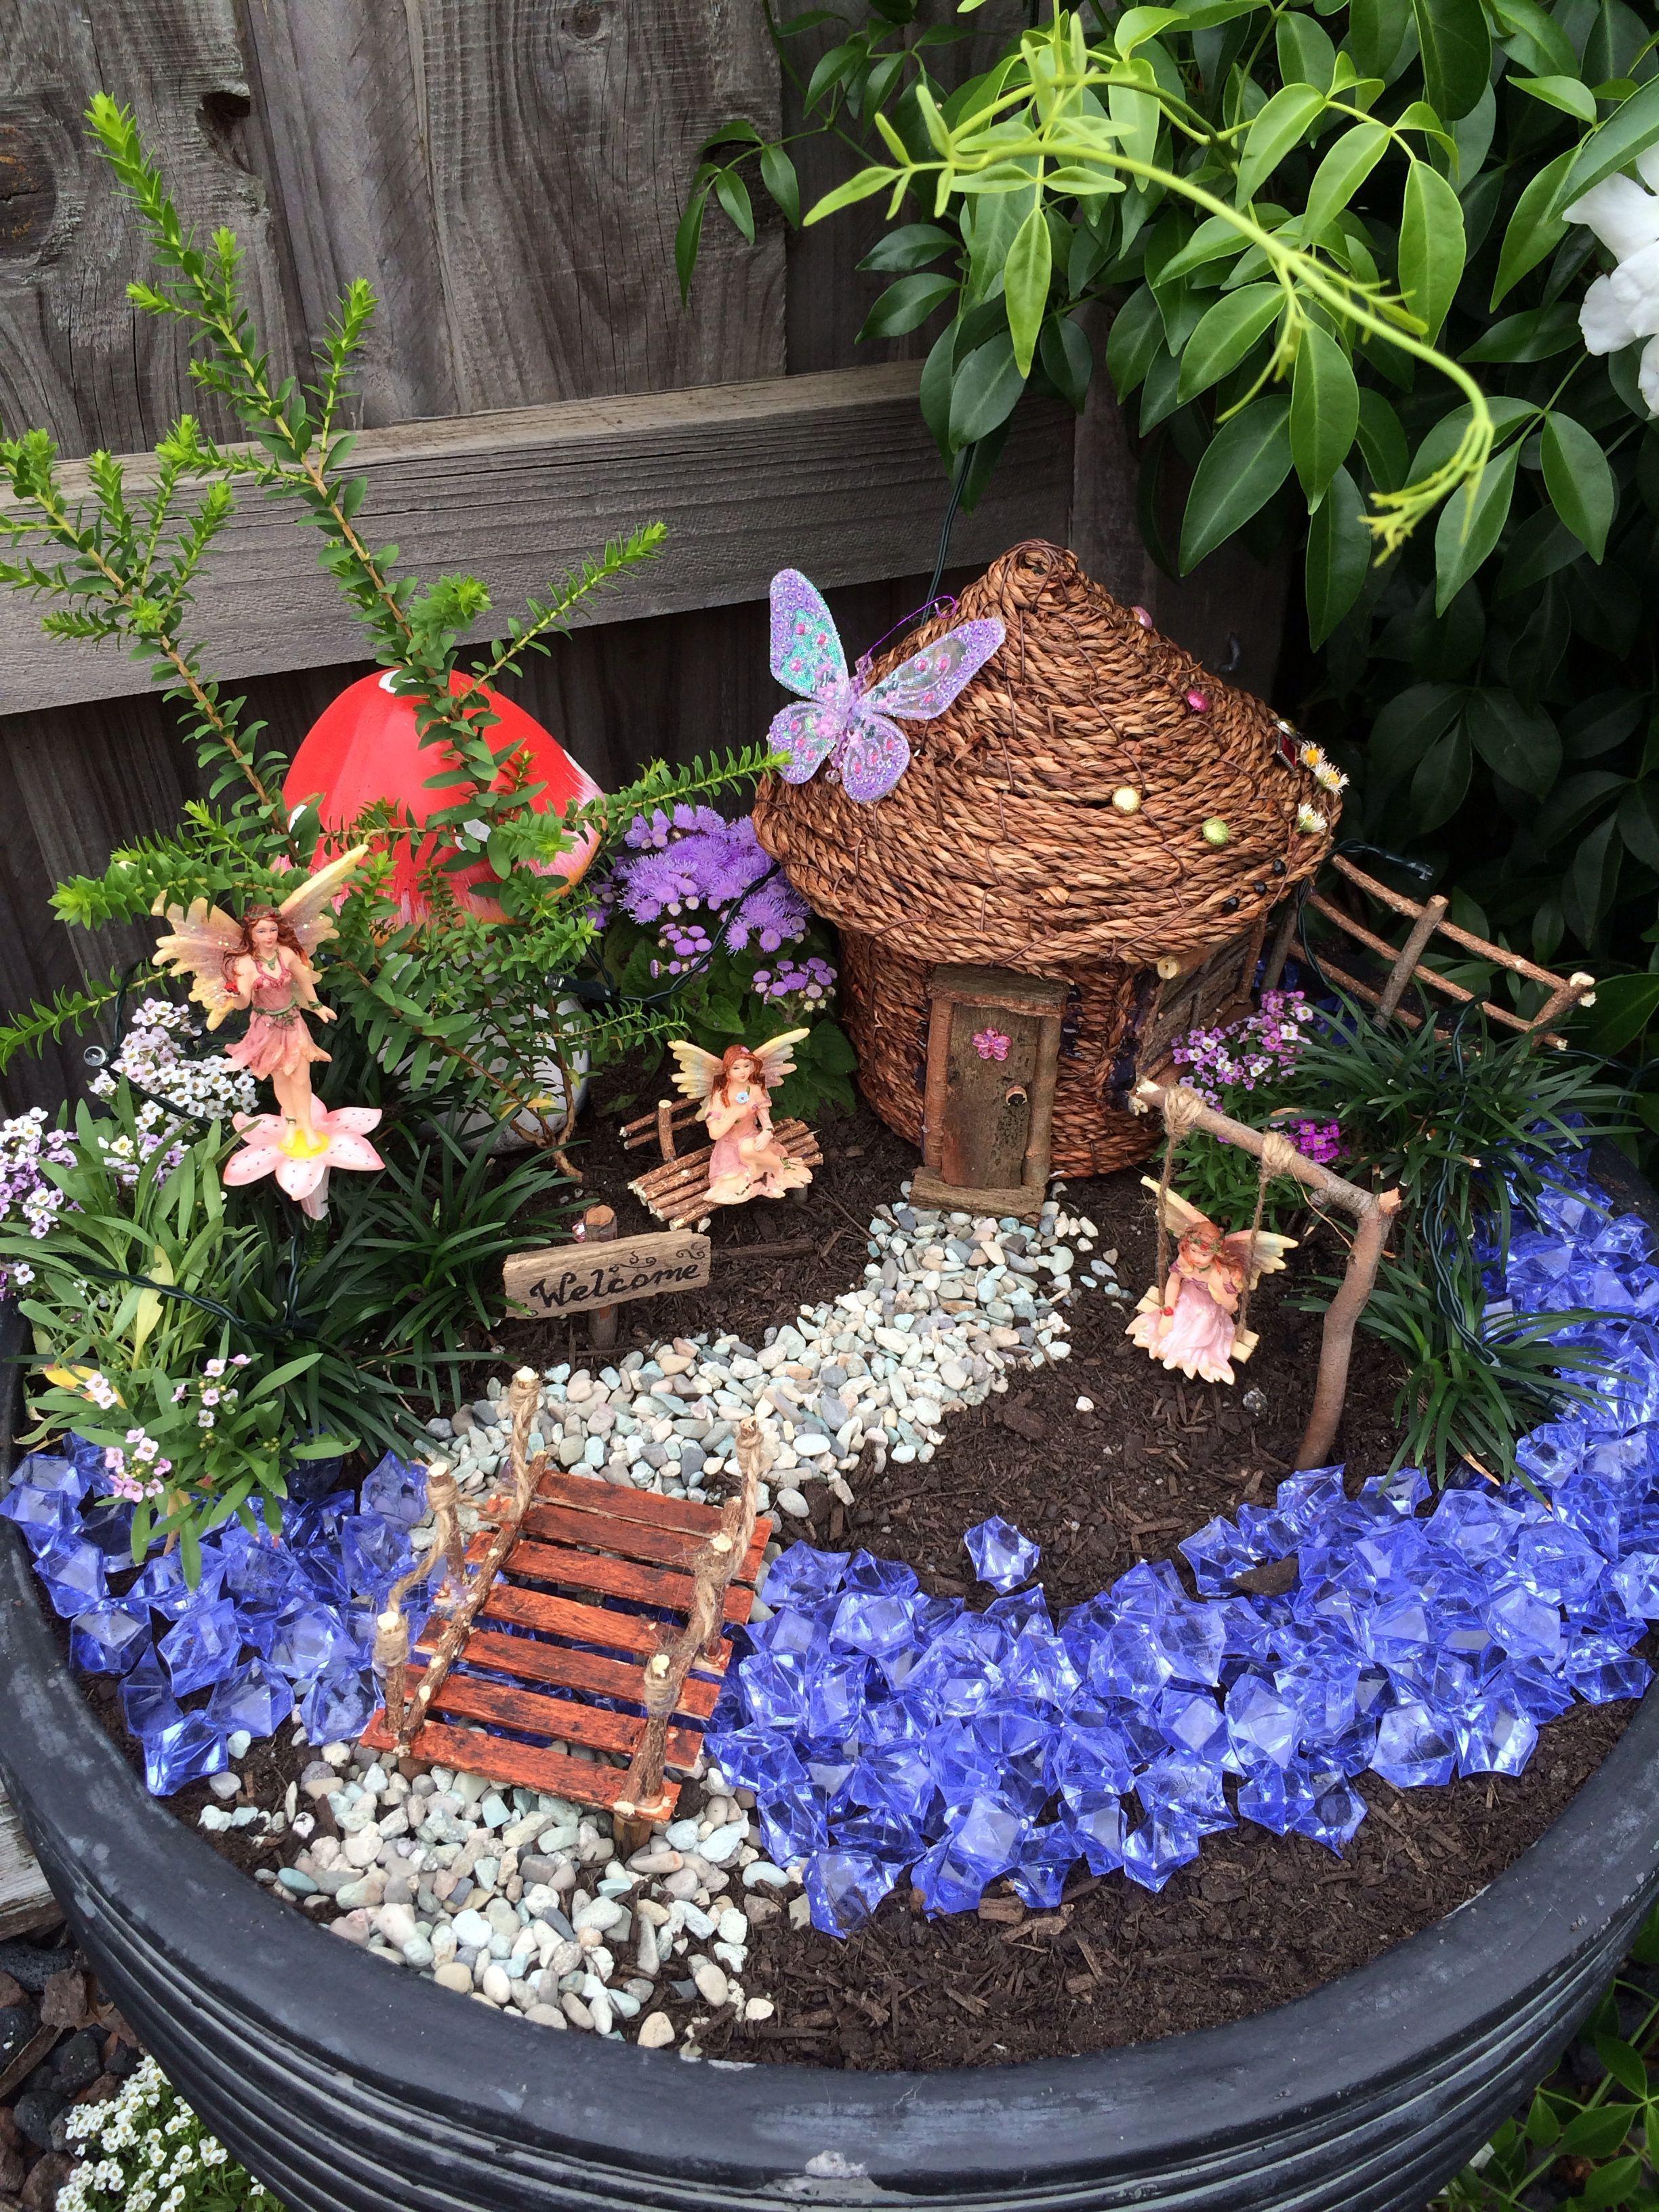 52 Lovely and Magical Miniature Fairy Garden Ideas -   Awesome miniature fairy garden ideas